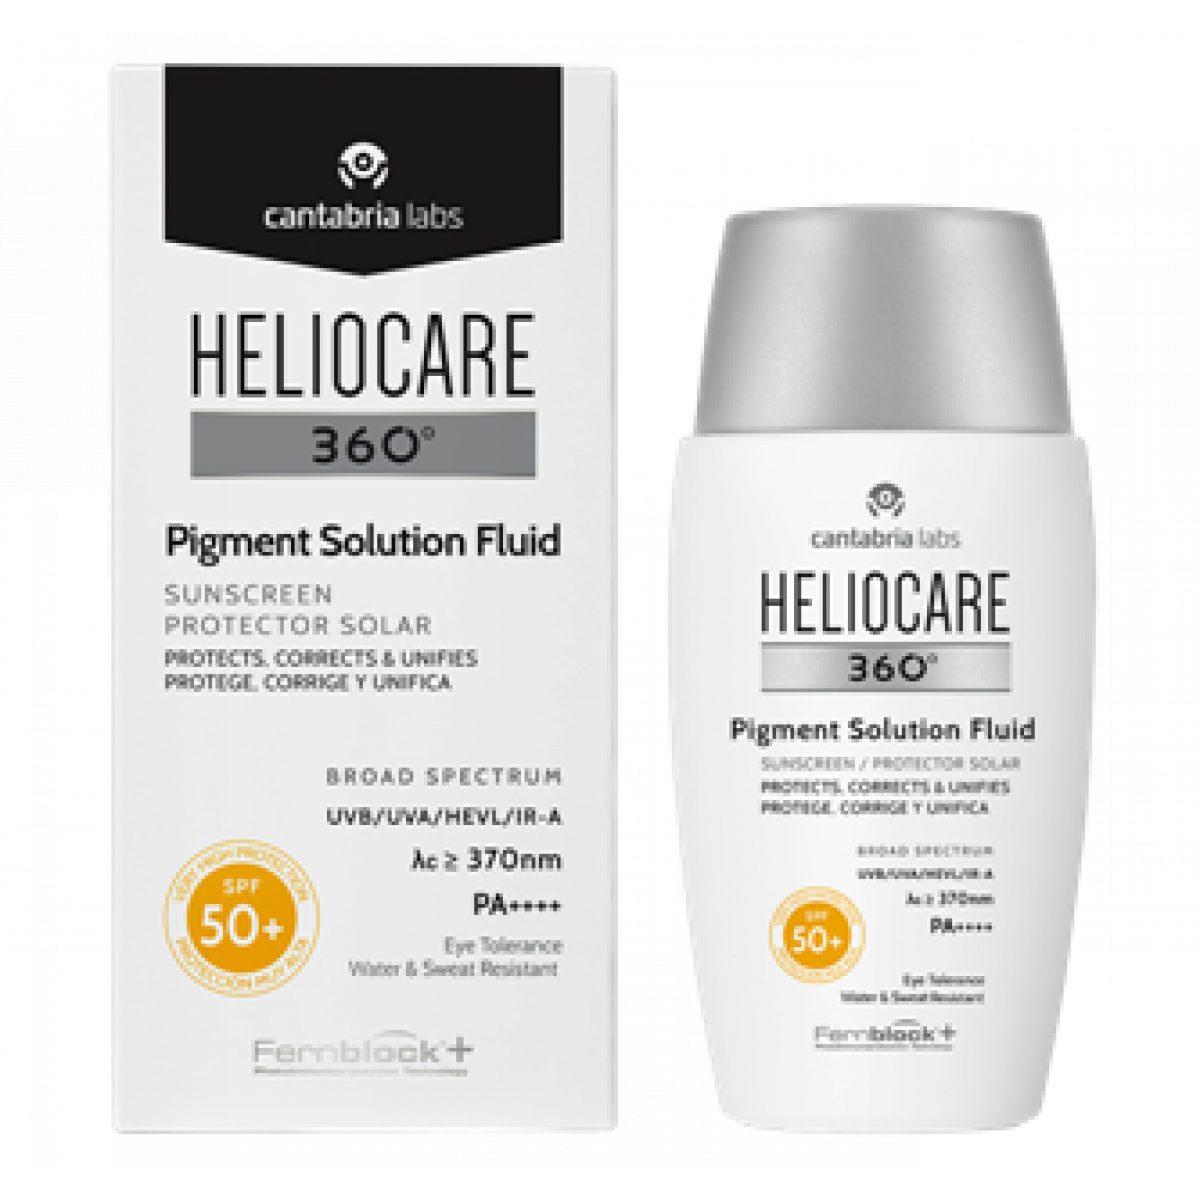 HELIOCARE 360 PIGMENT SOLUTION FLUID PROTECTIE SOLARA SPF50+